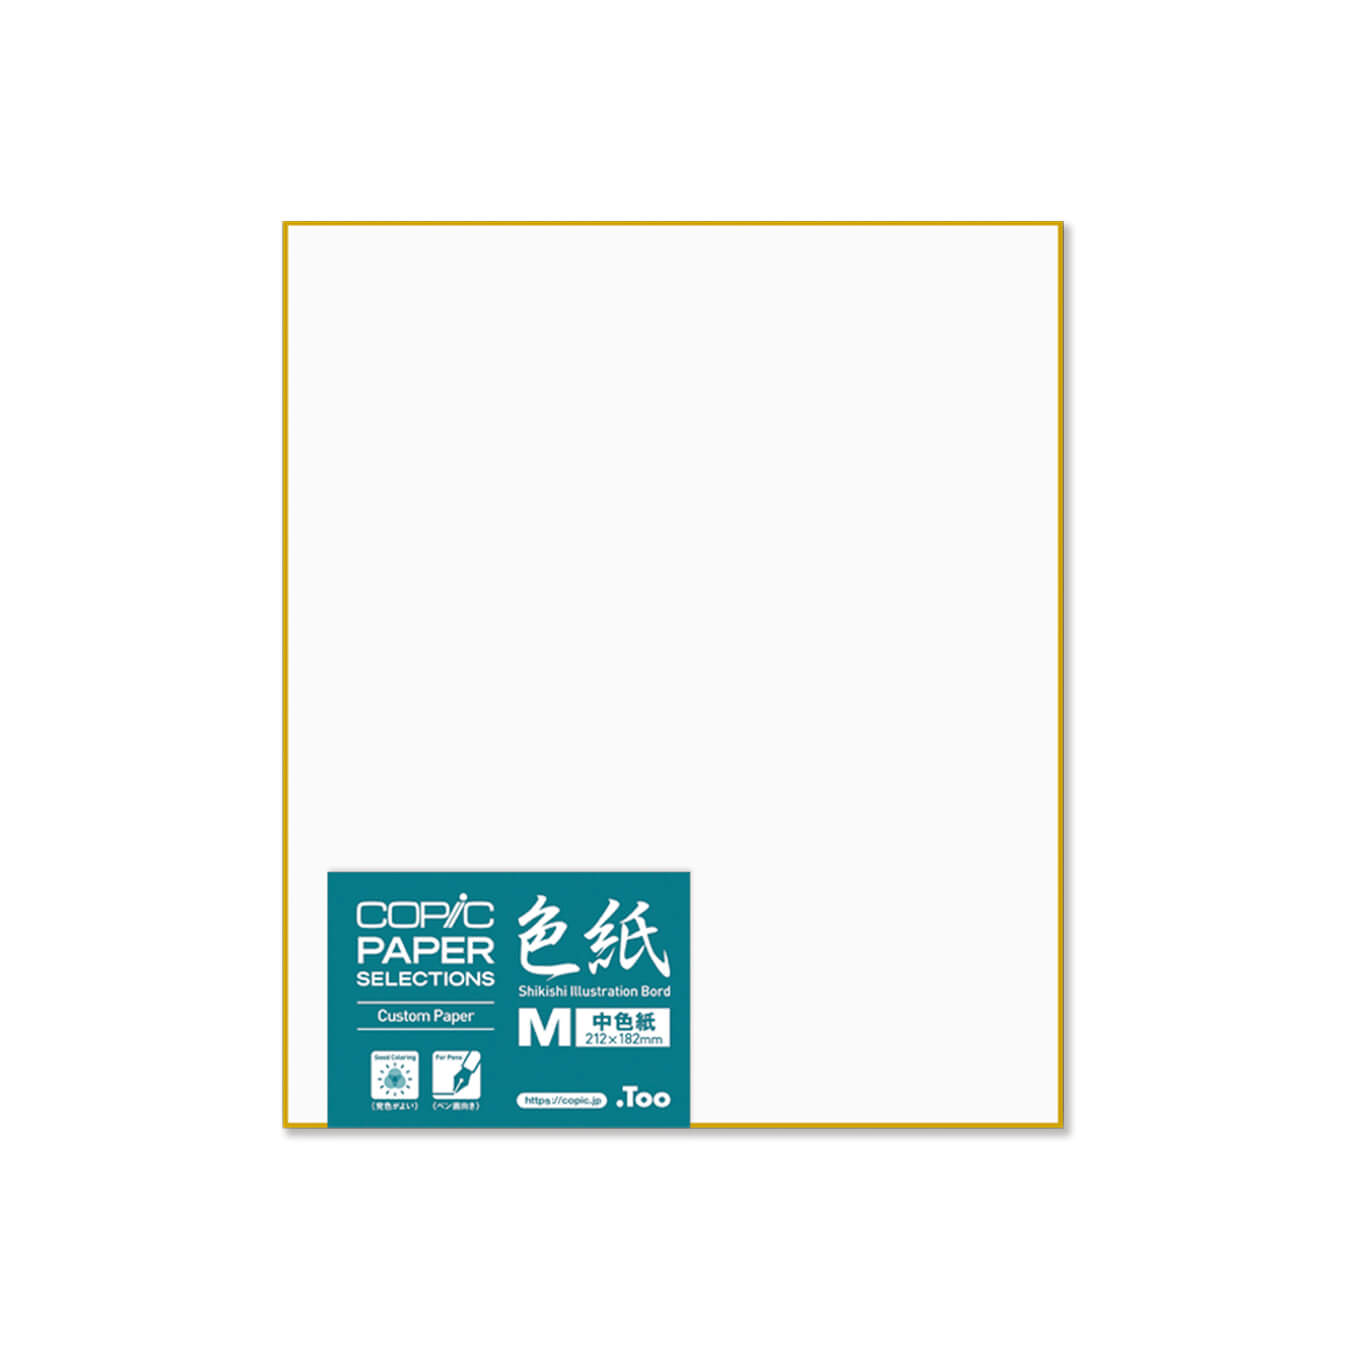 Copic Shikishi Illustration Board M size